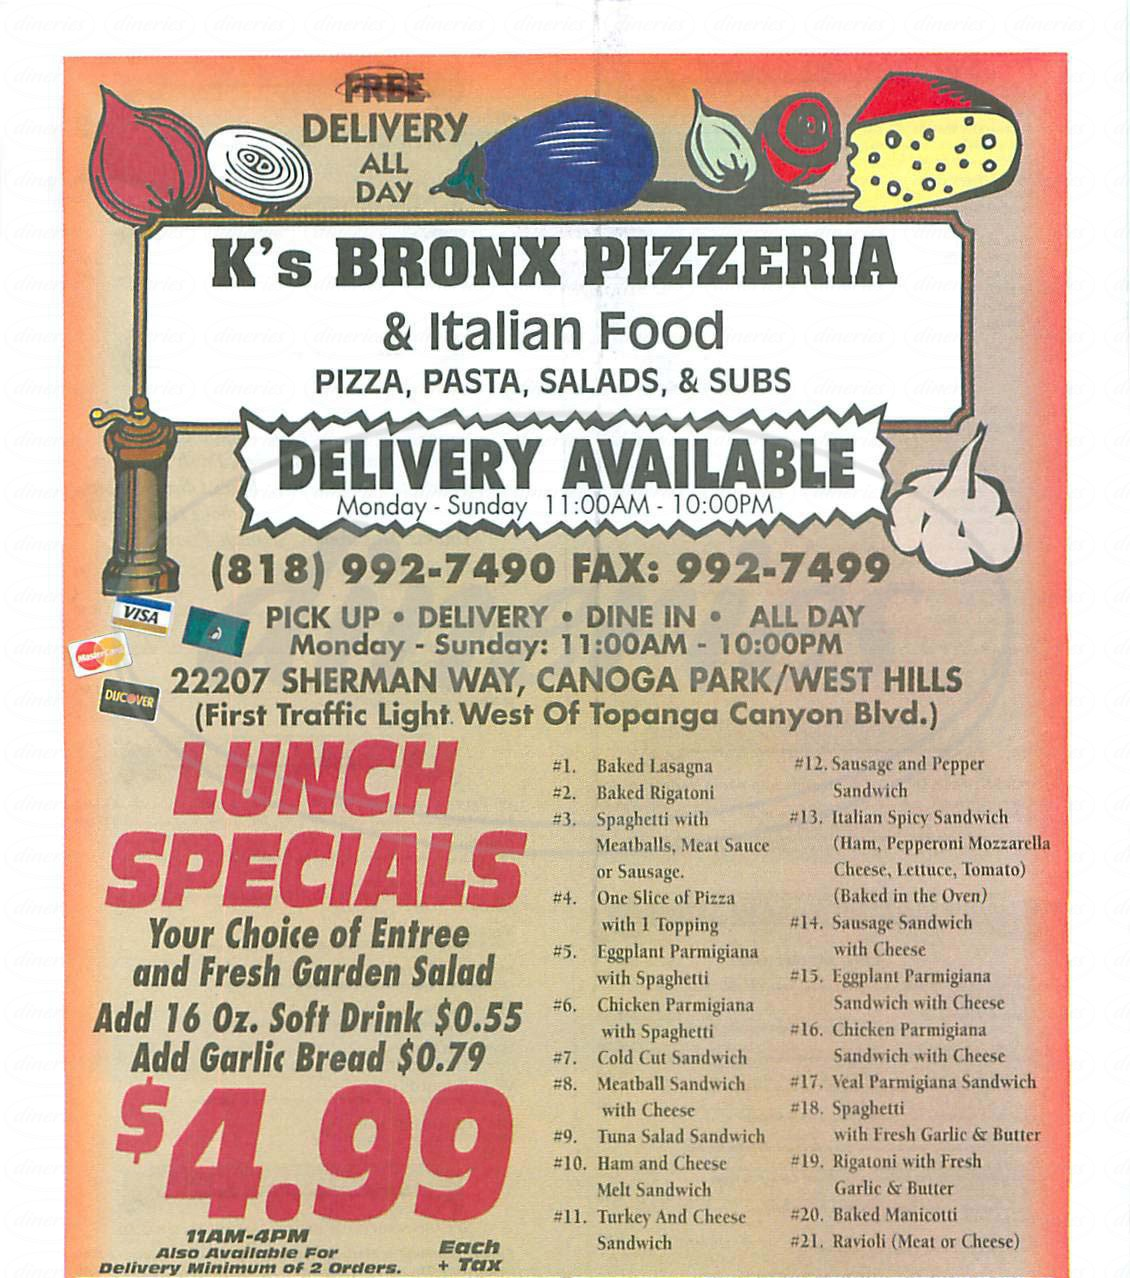 menu for K's Bronx Pizzeria & Italian Foods